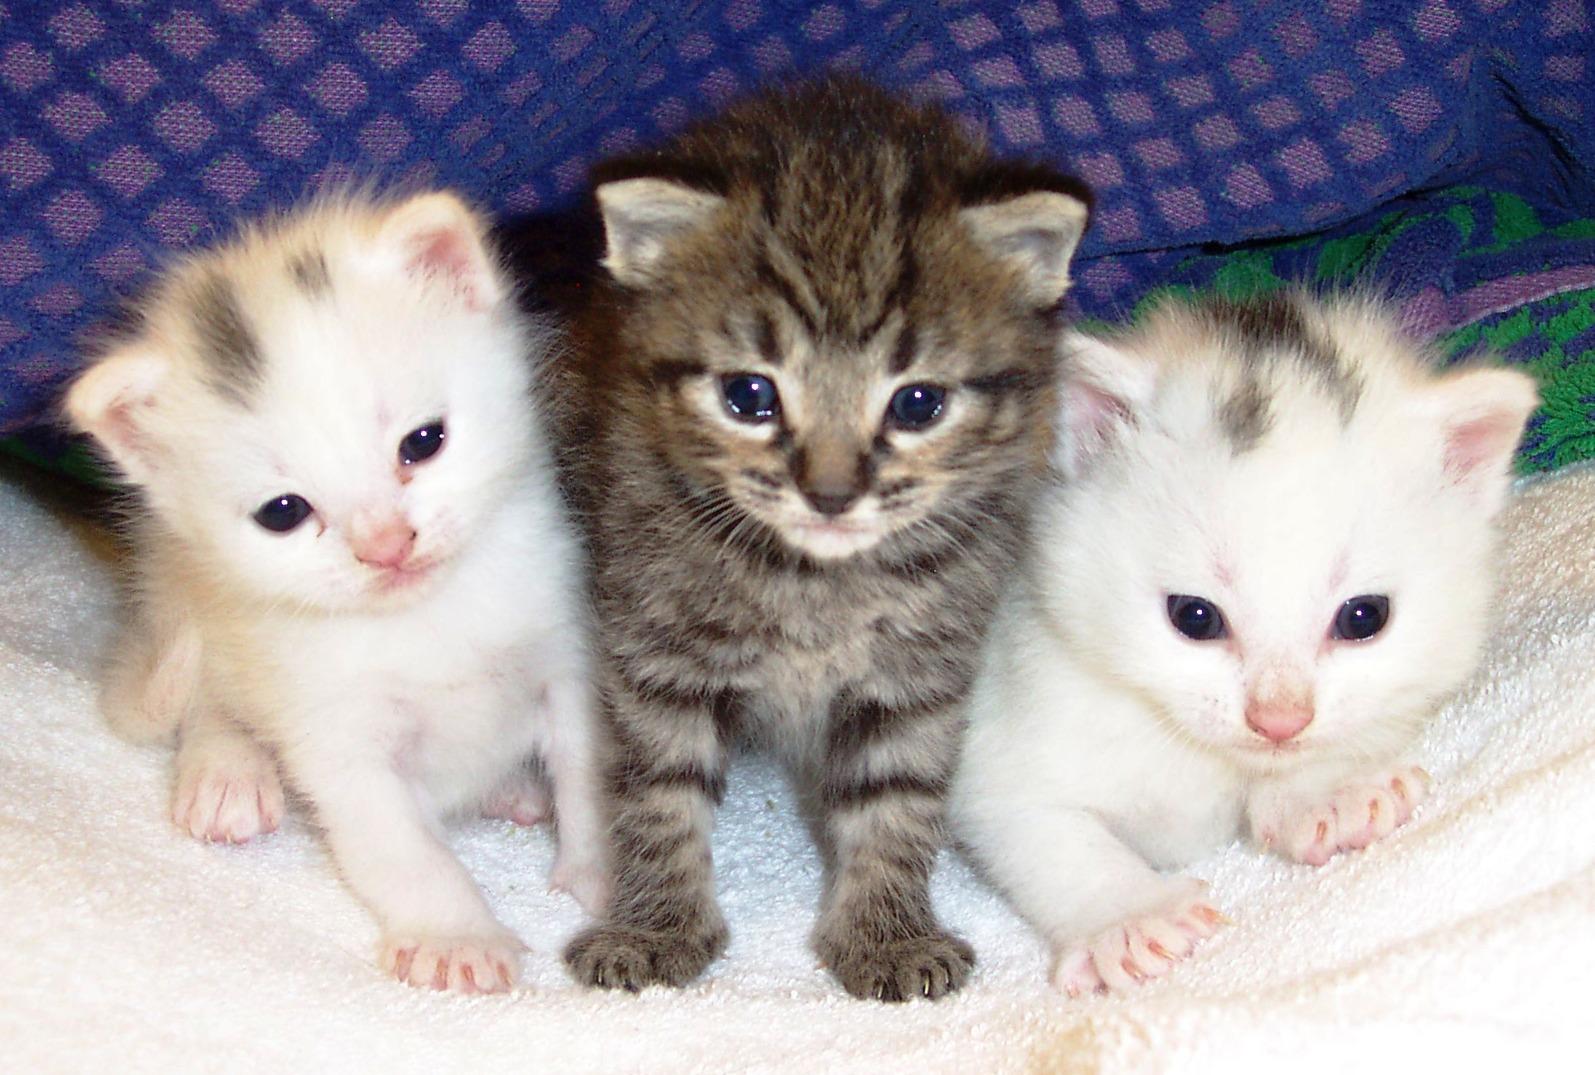 بالصور صور قطط متحركة , صور قطط كيوت 6317 4